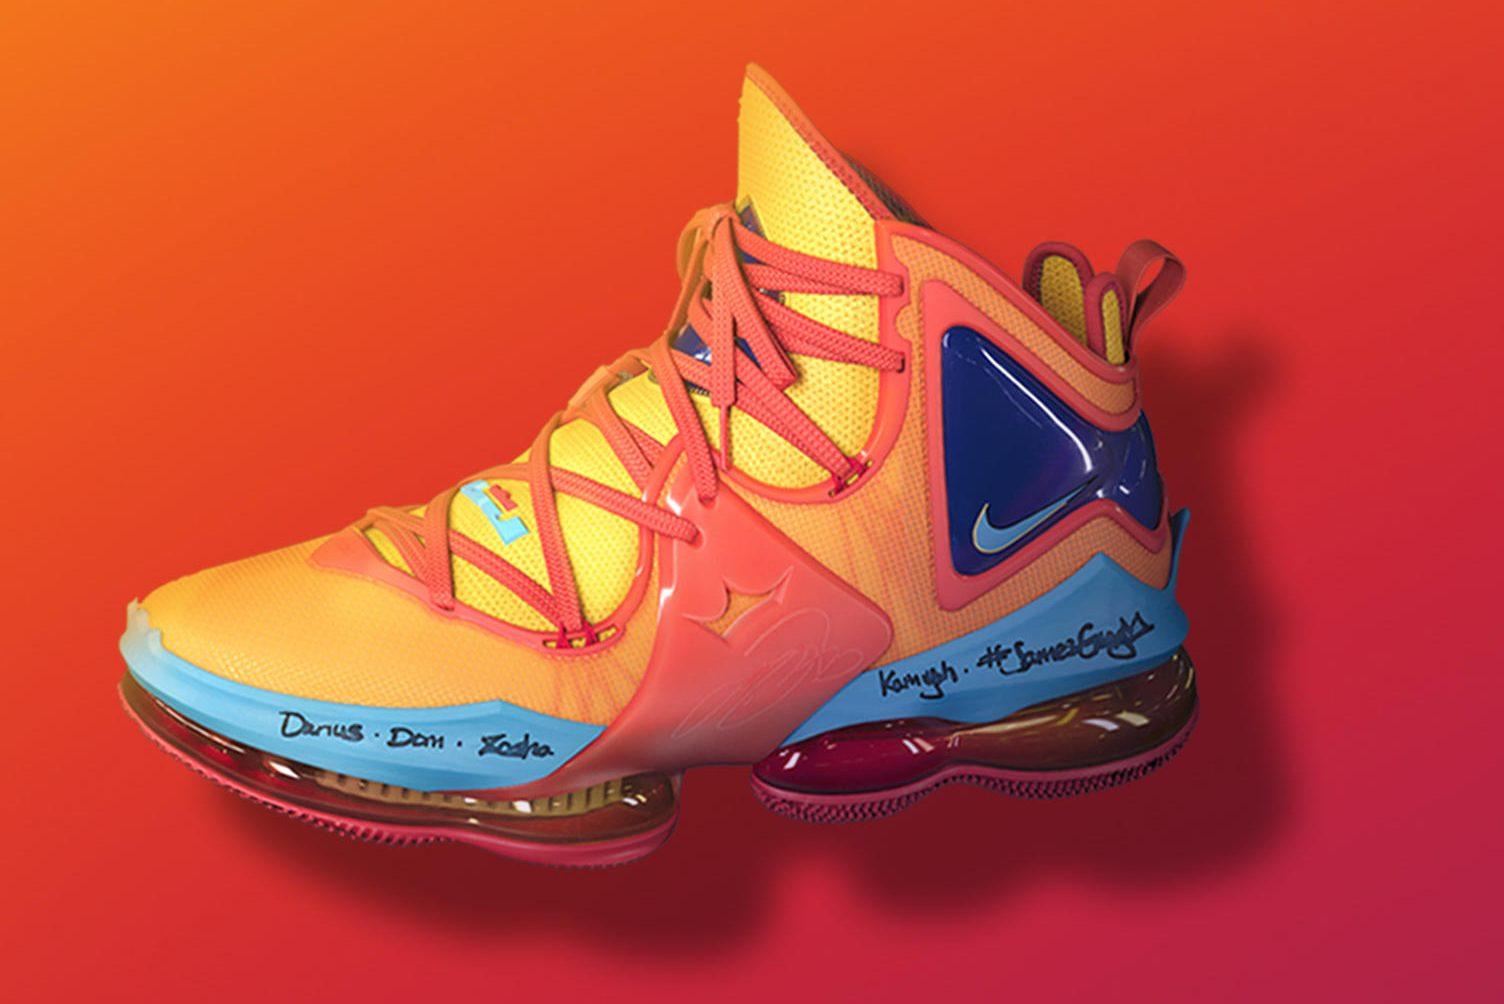 Lebron James scarpe, Space Jam: New Legends